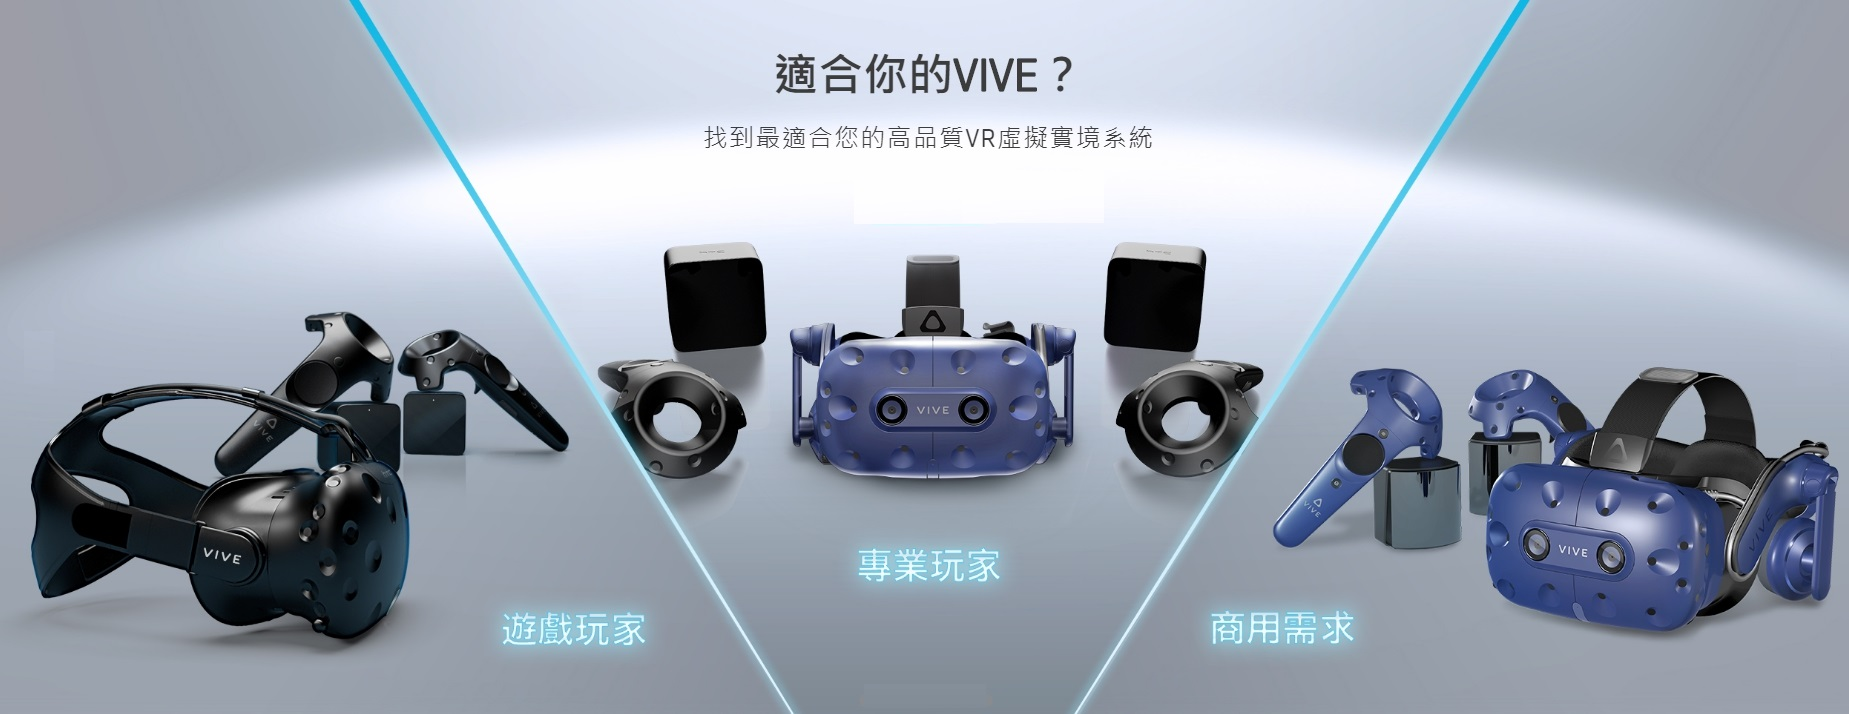 2019 HTC VIVE VR